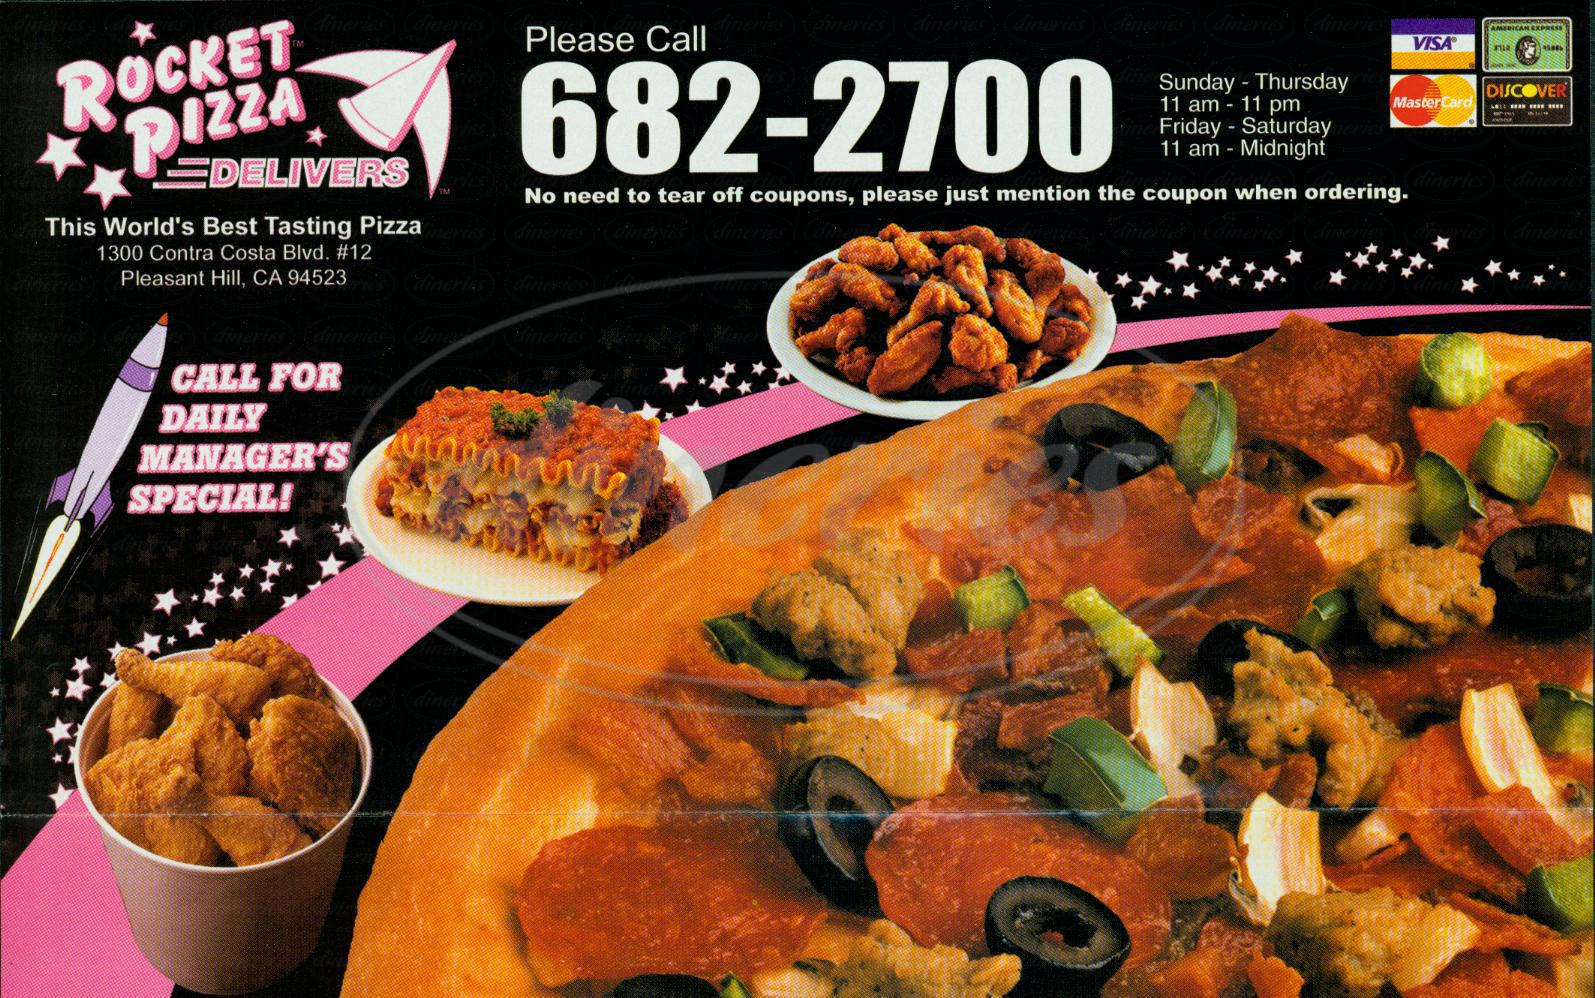 menu for Rocket Pizza